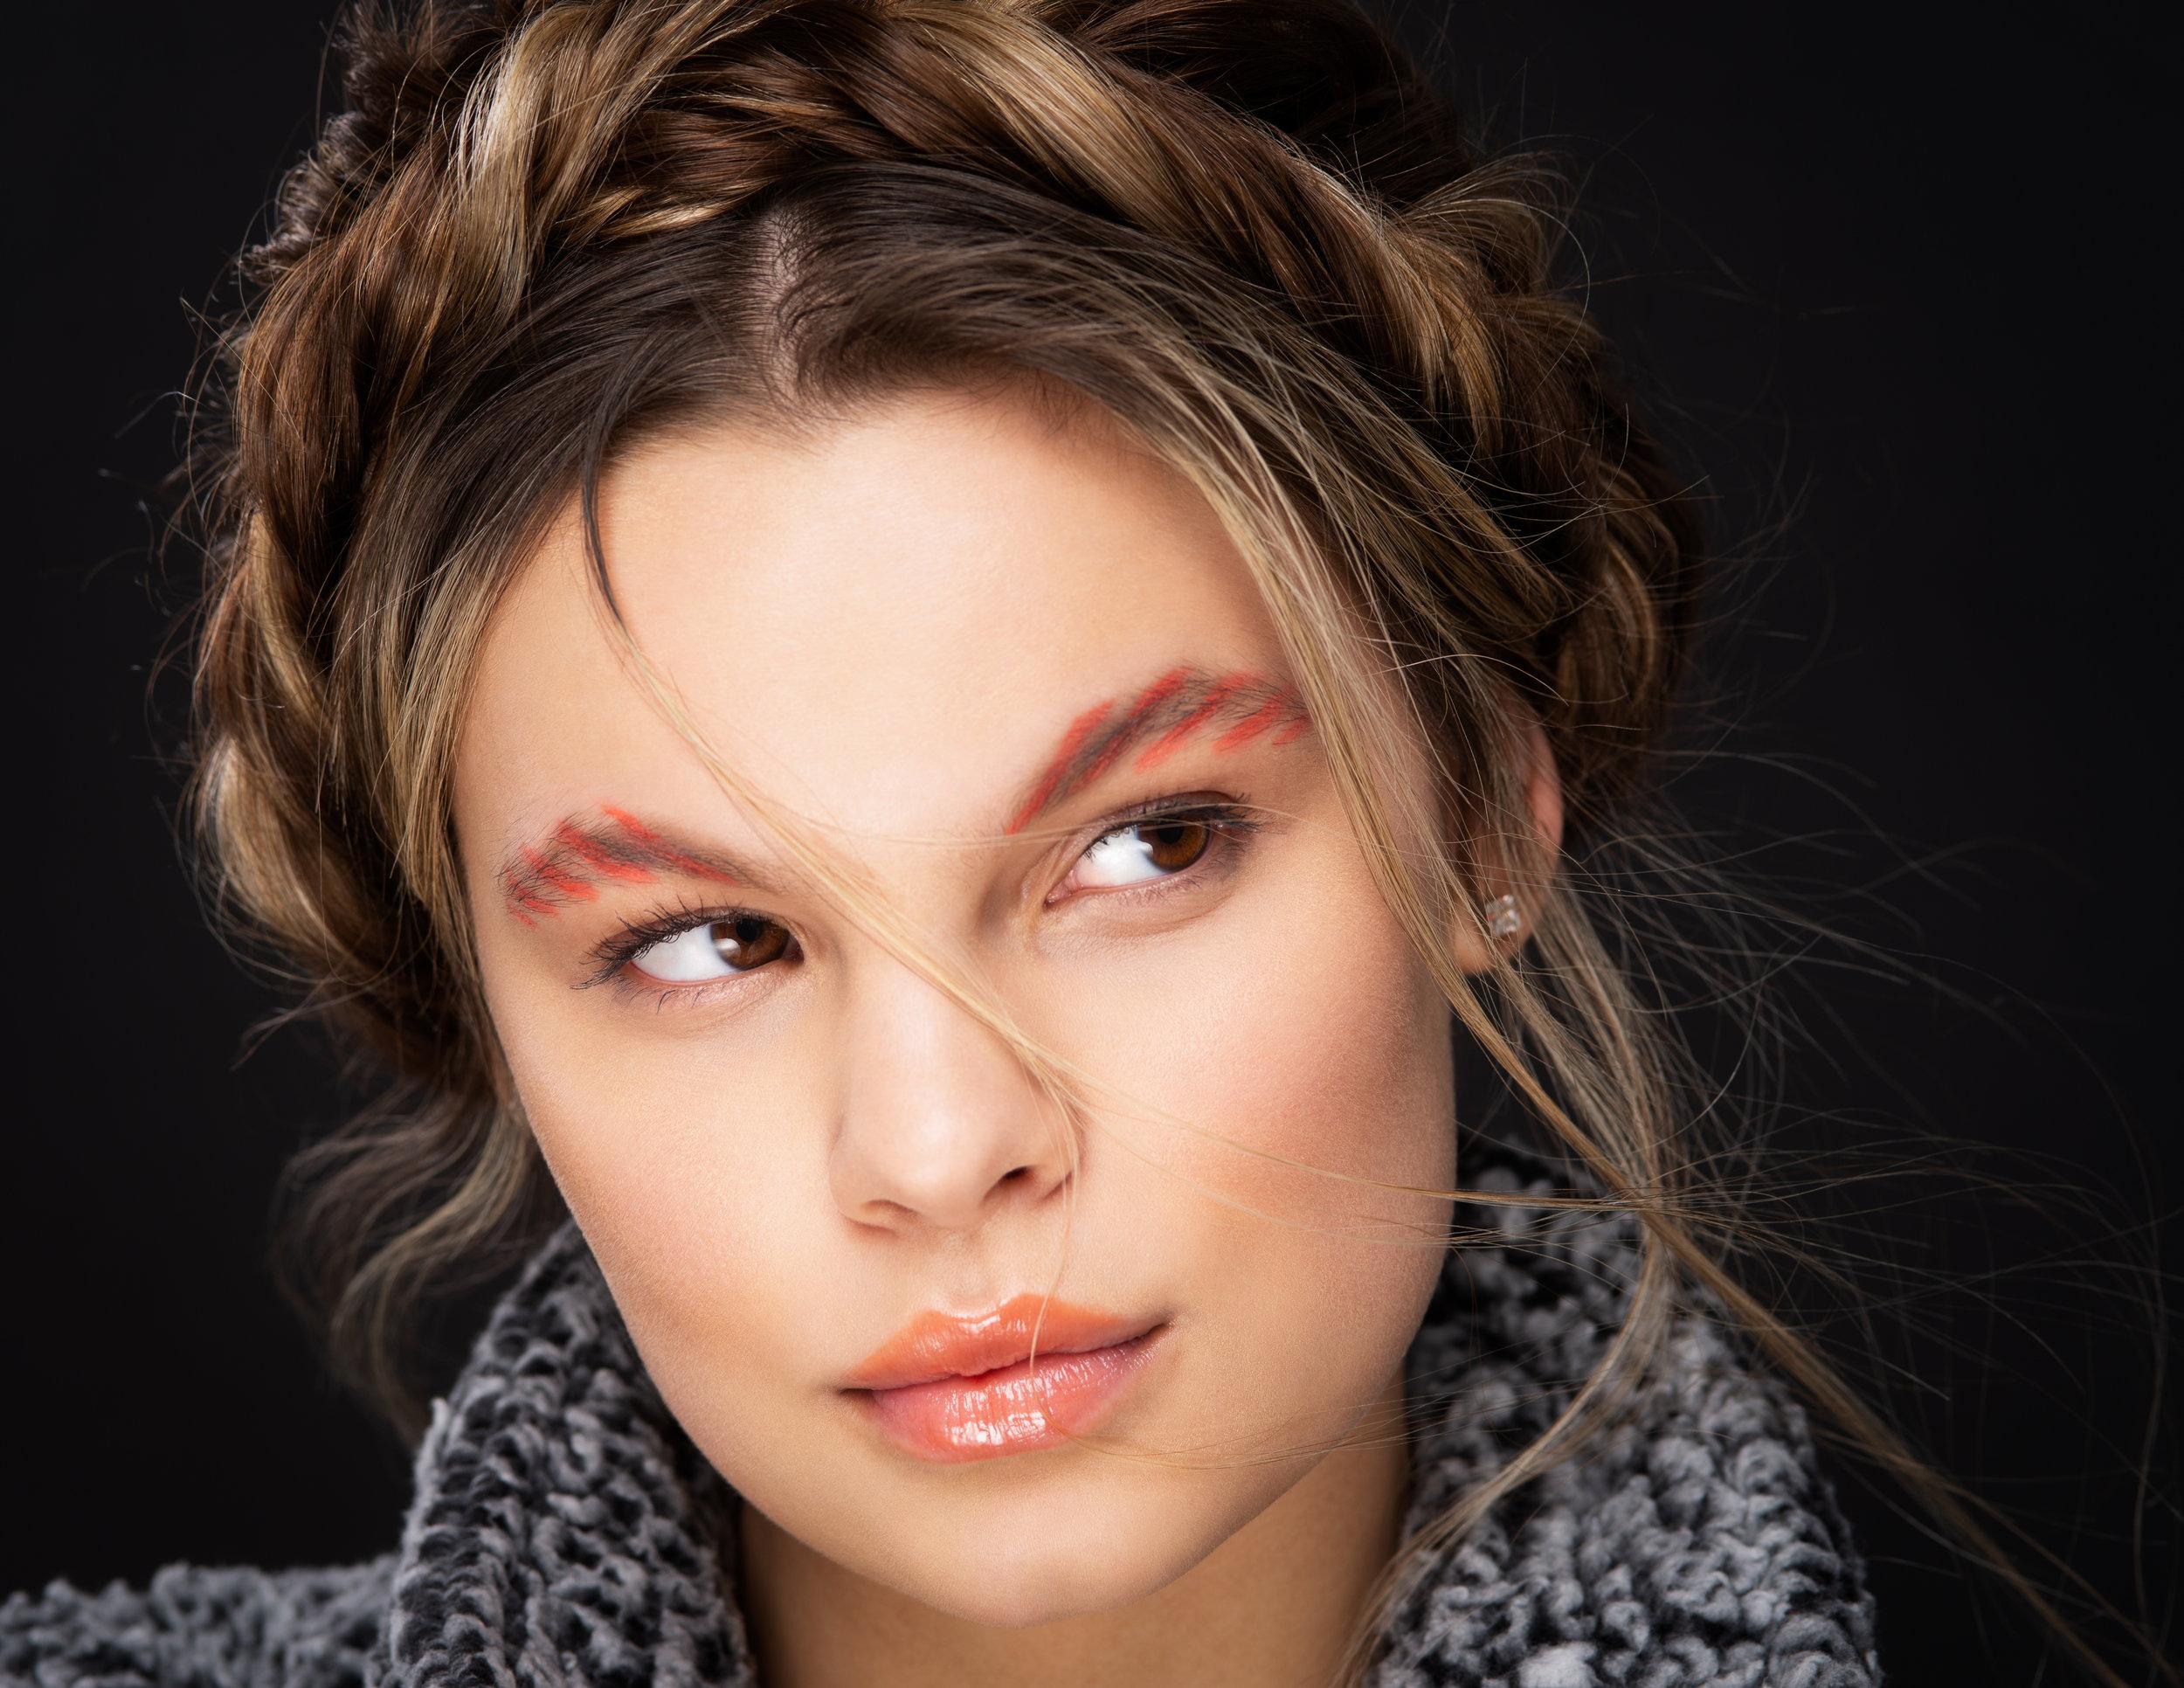 Beauty-Photographer-Patrick-Simmons-Chicago-0-0.jpg